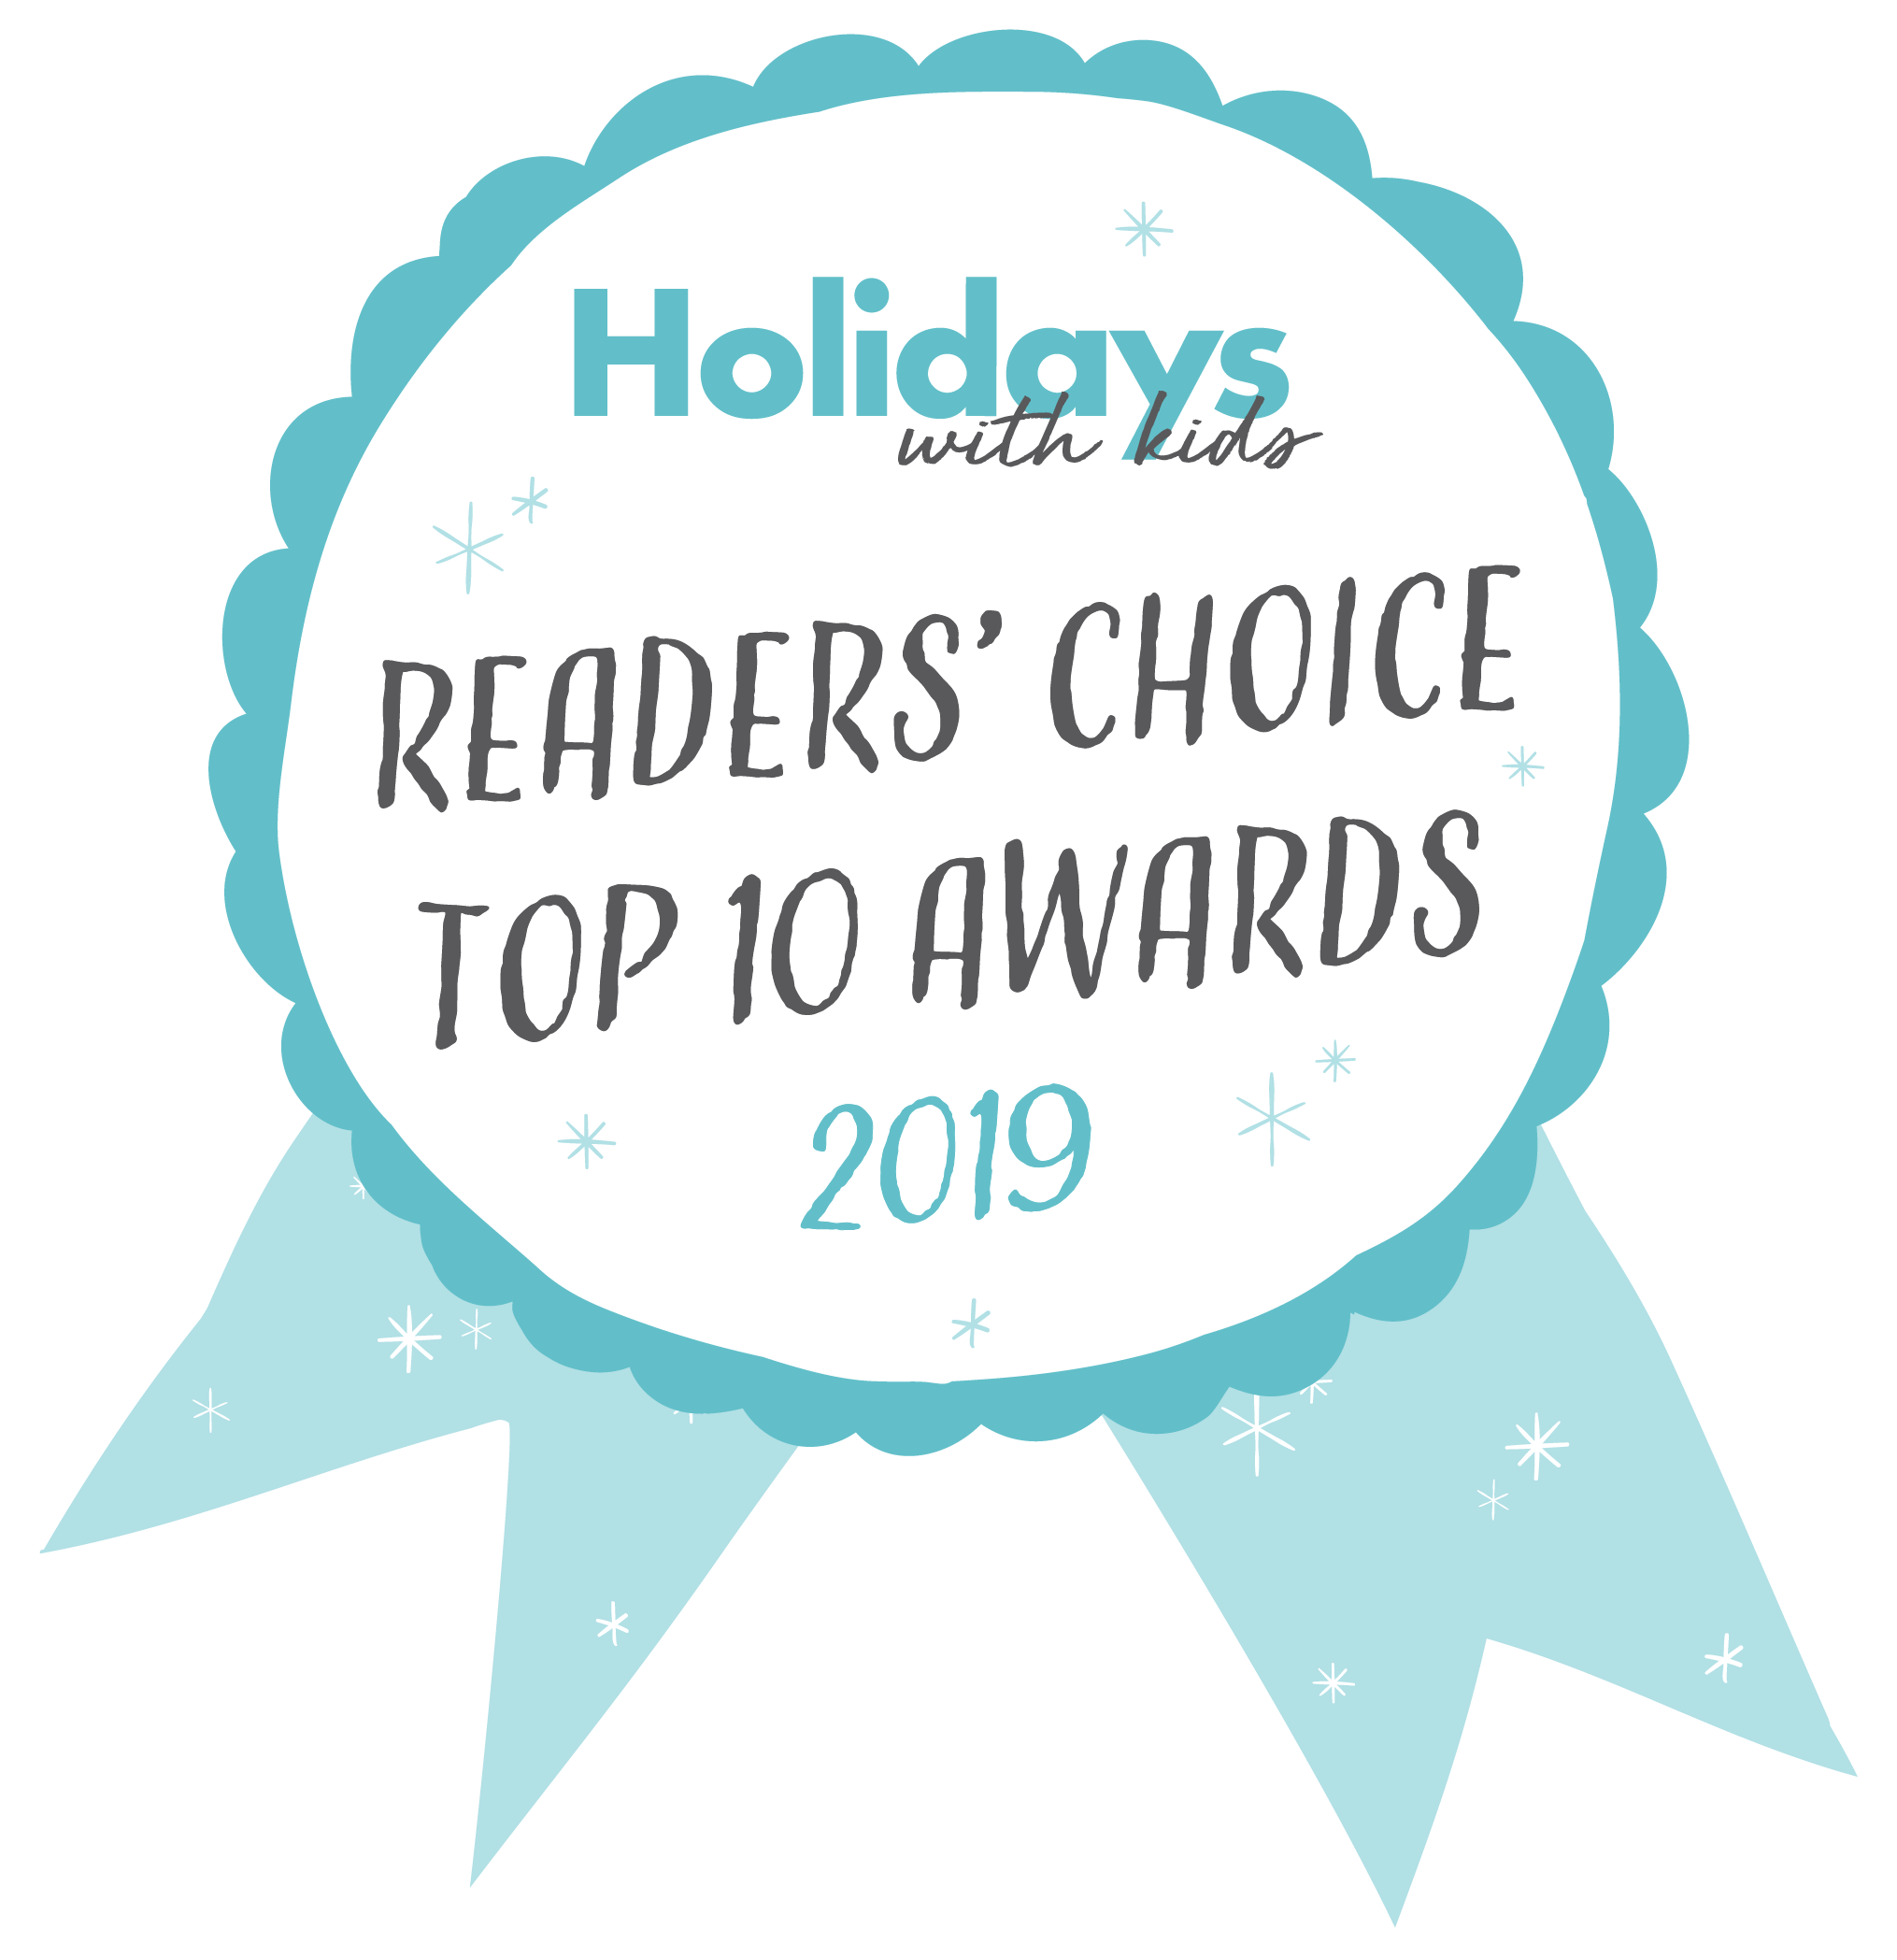 HWK Readers' Choice Top 10 Awards LOGO_2019-Shorter.png